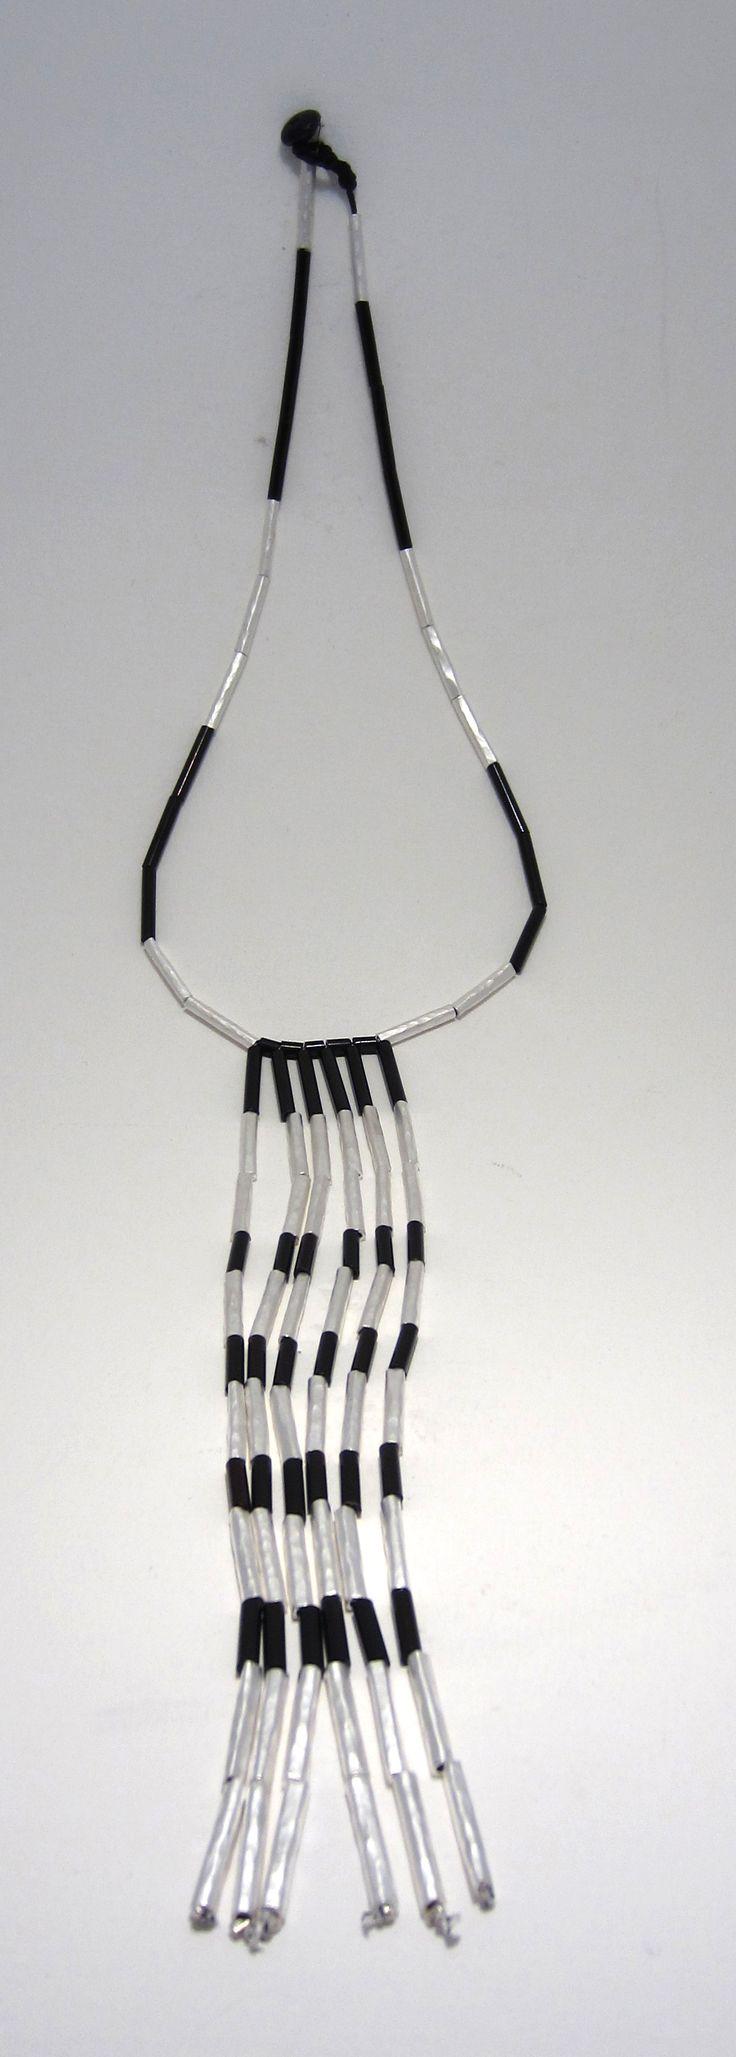 Anna Balasoglou - Piupiu Necklace - sterling silver plated copper and black chrome